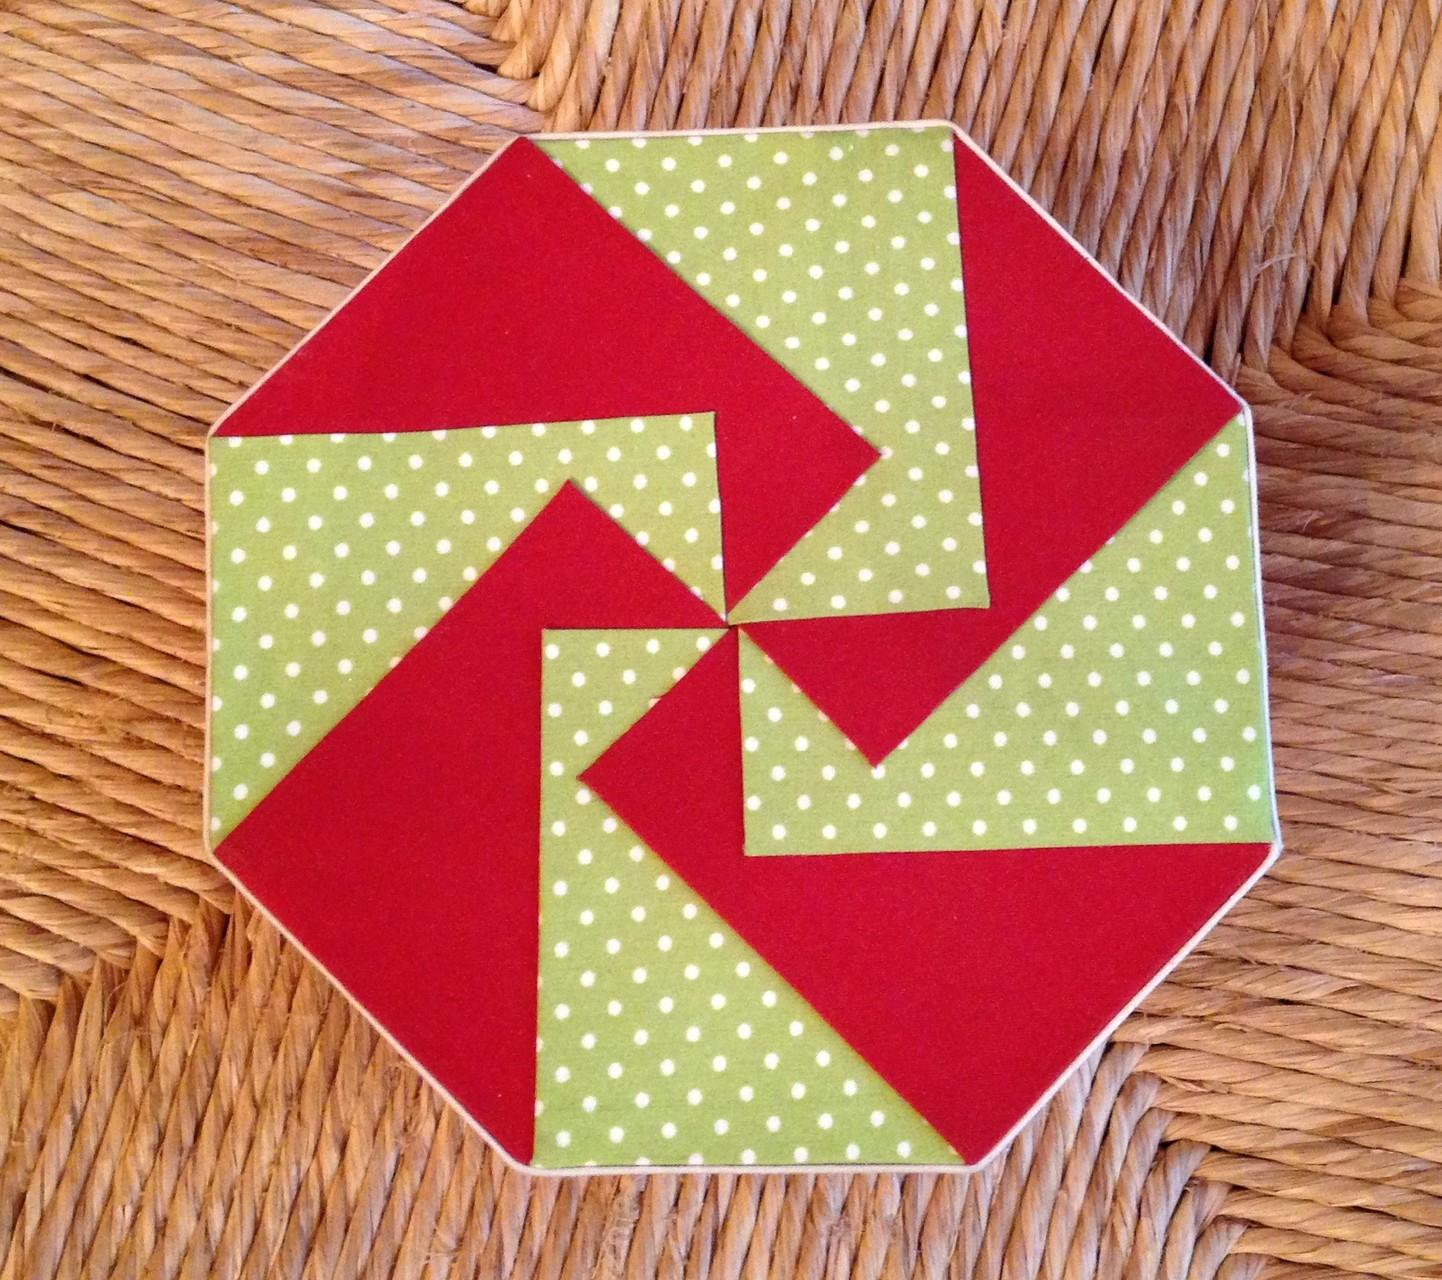 dessus forme octogonale